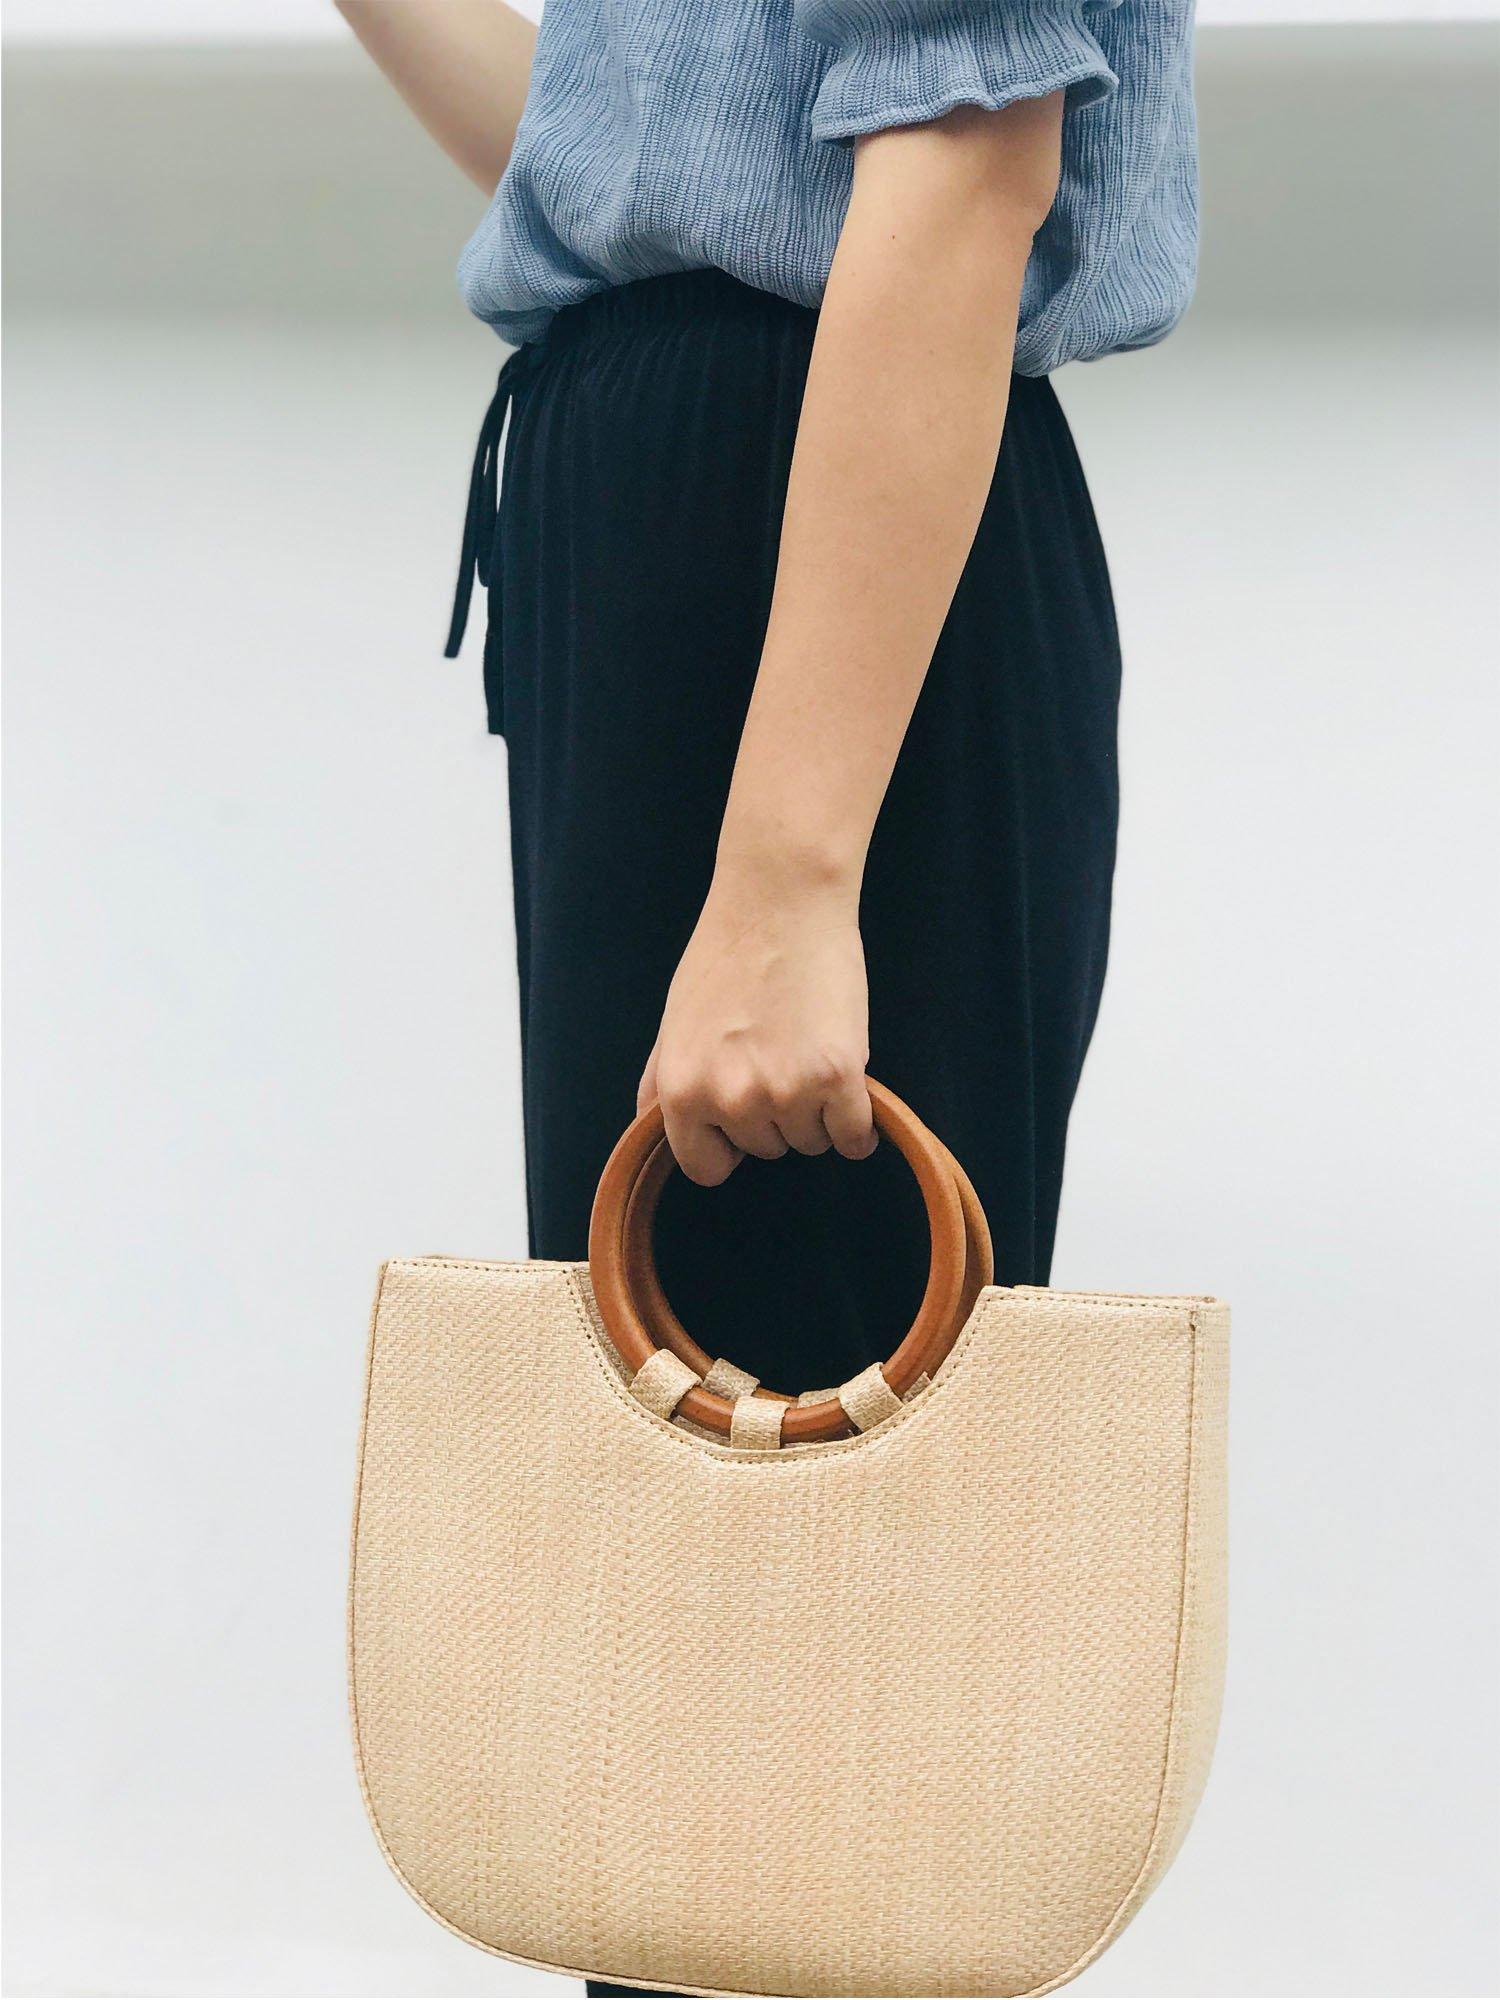 Youndcc Women Woven Straw Bag Rattan Bag Tote Bag Shoulder Bag Crossbody Bag Handbag Beach Bag, Handwoven/Crochet/Round Handle by Youndcc (Image #6)